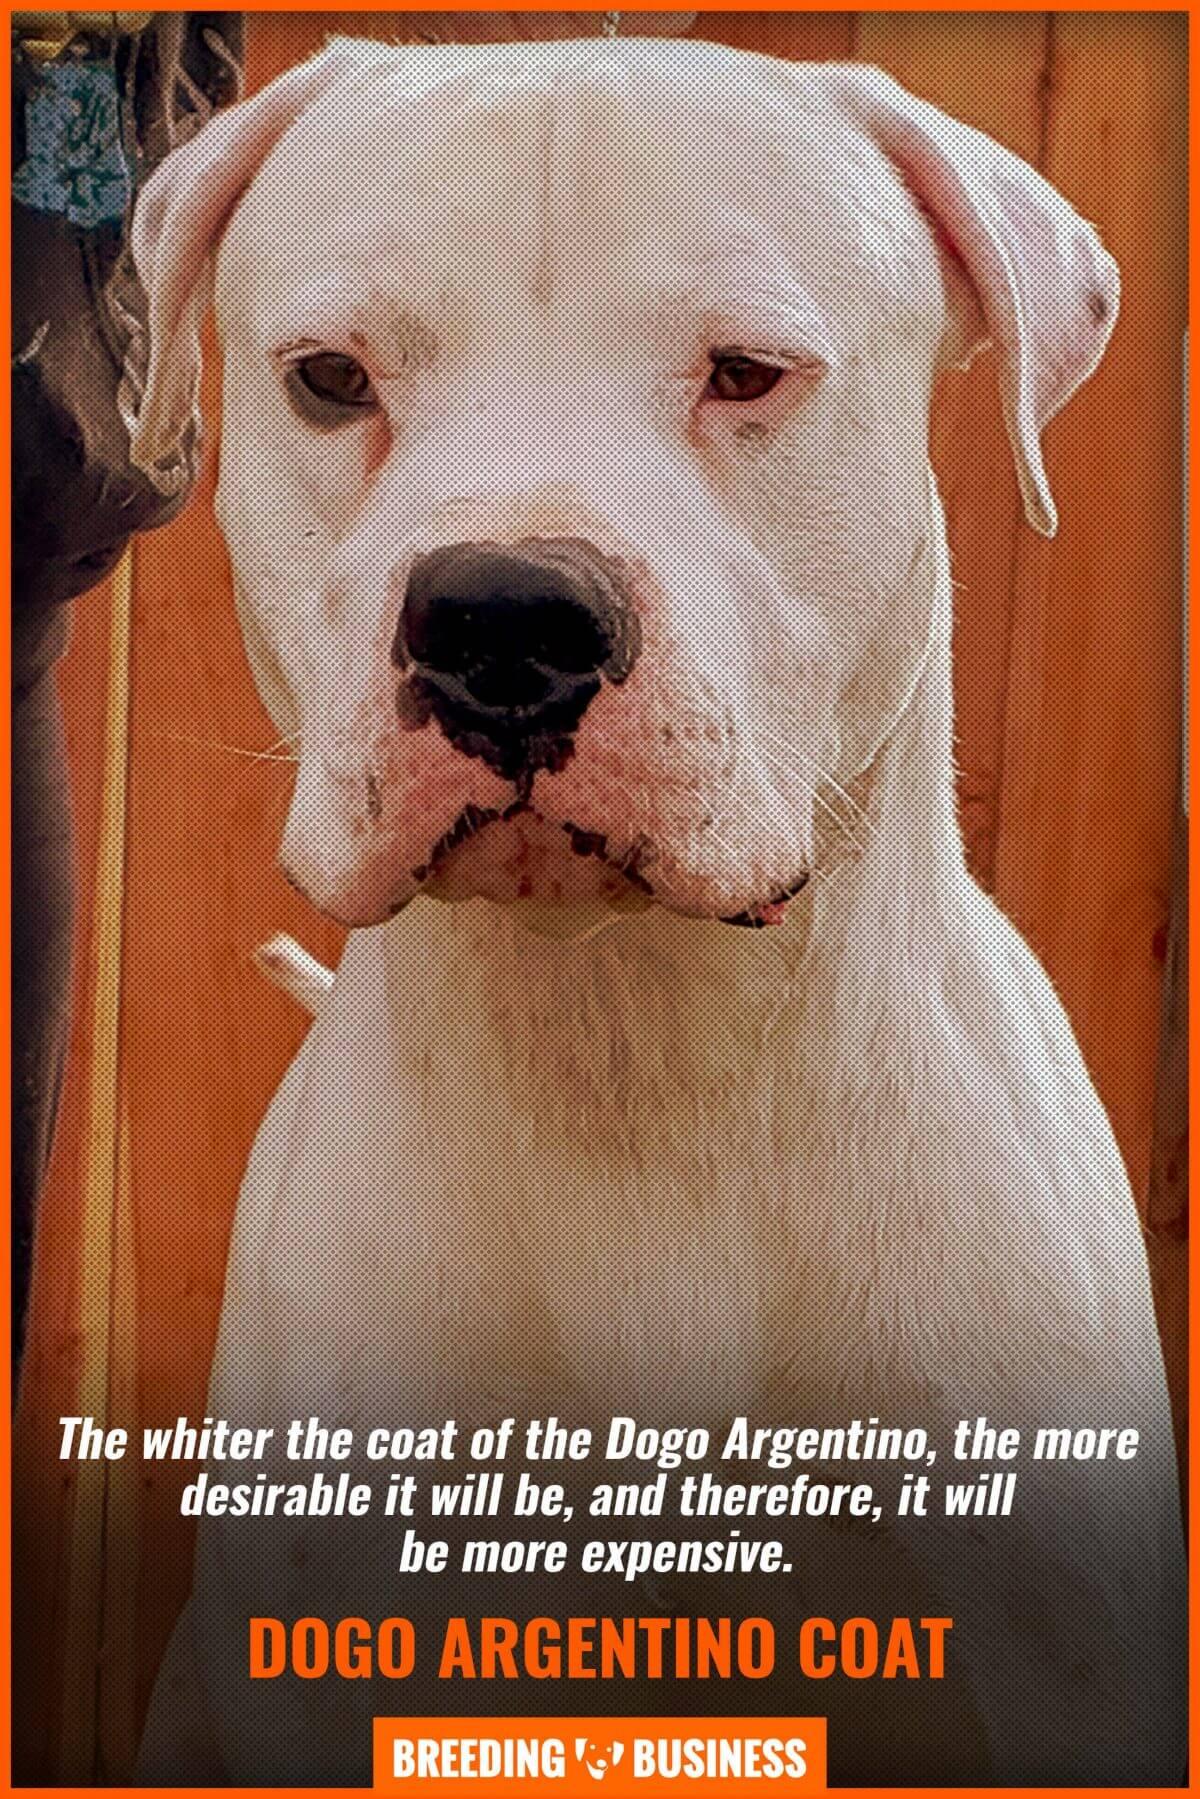 dogo argentino's white coat